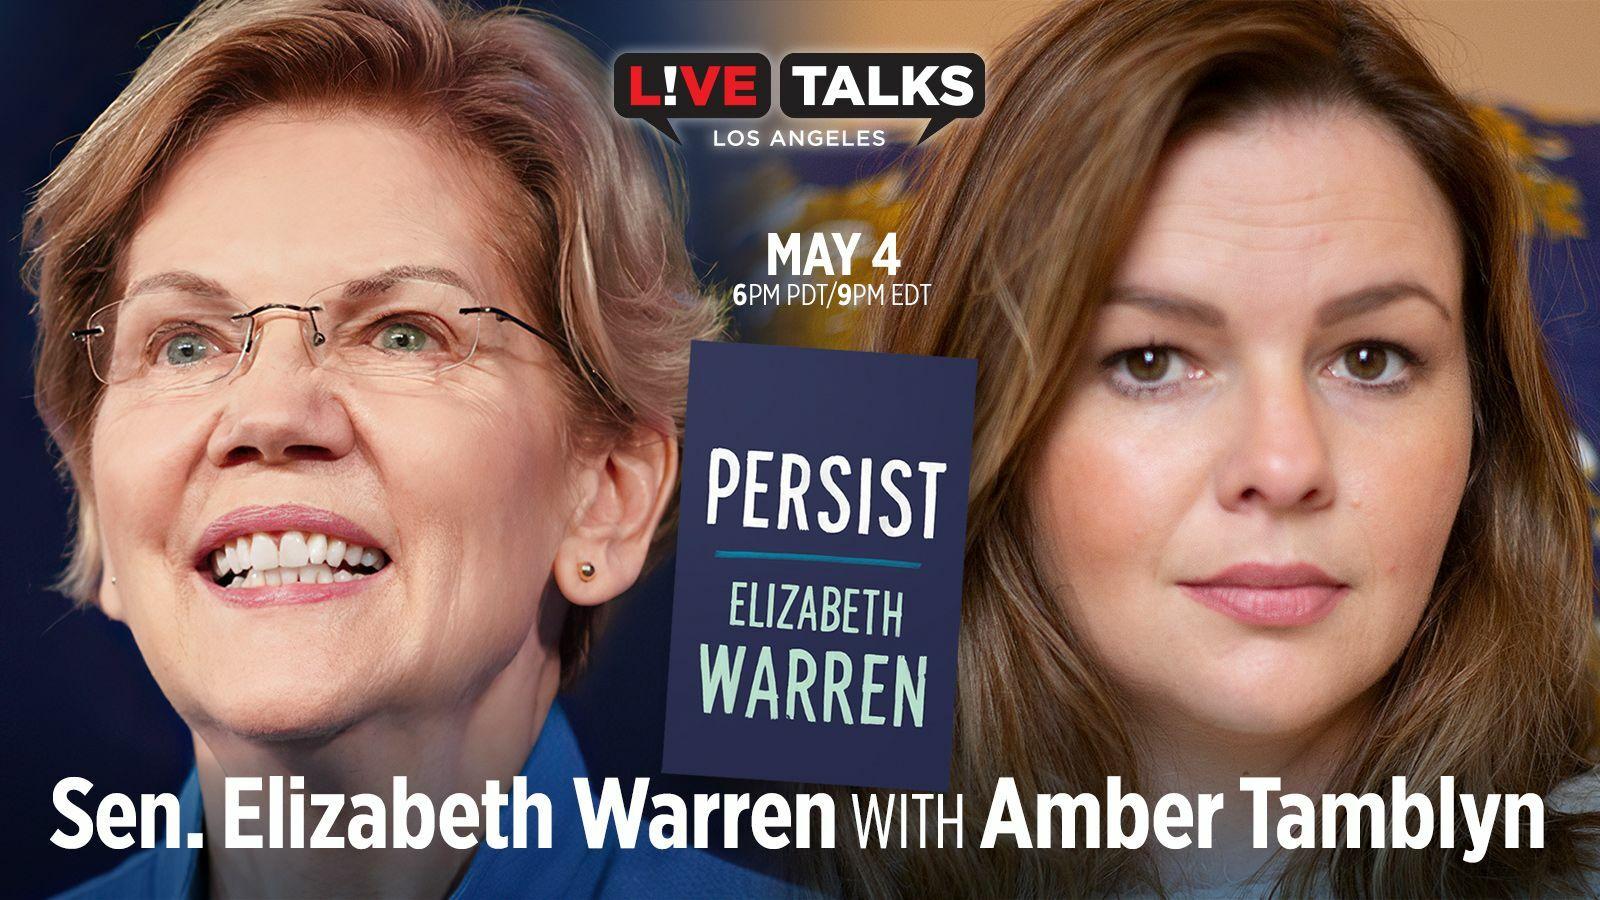 Senator Elizabeth Warren with Amber Tamblyn - Online